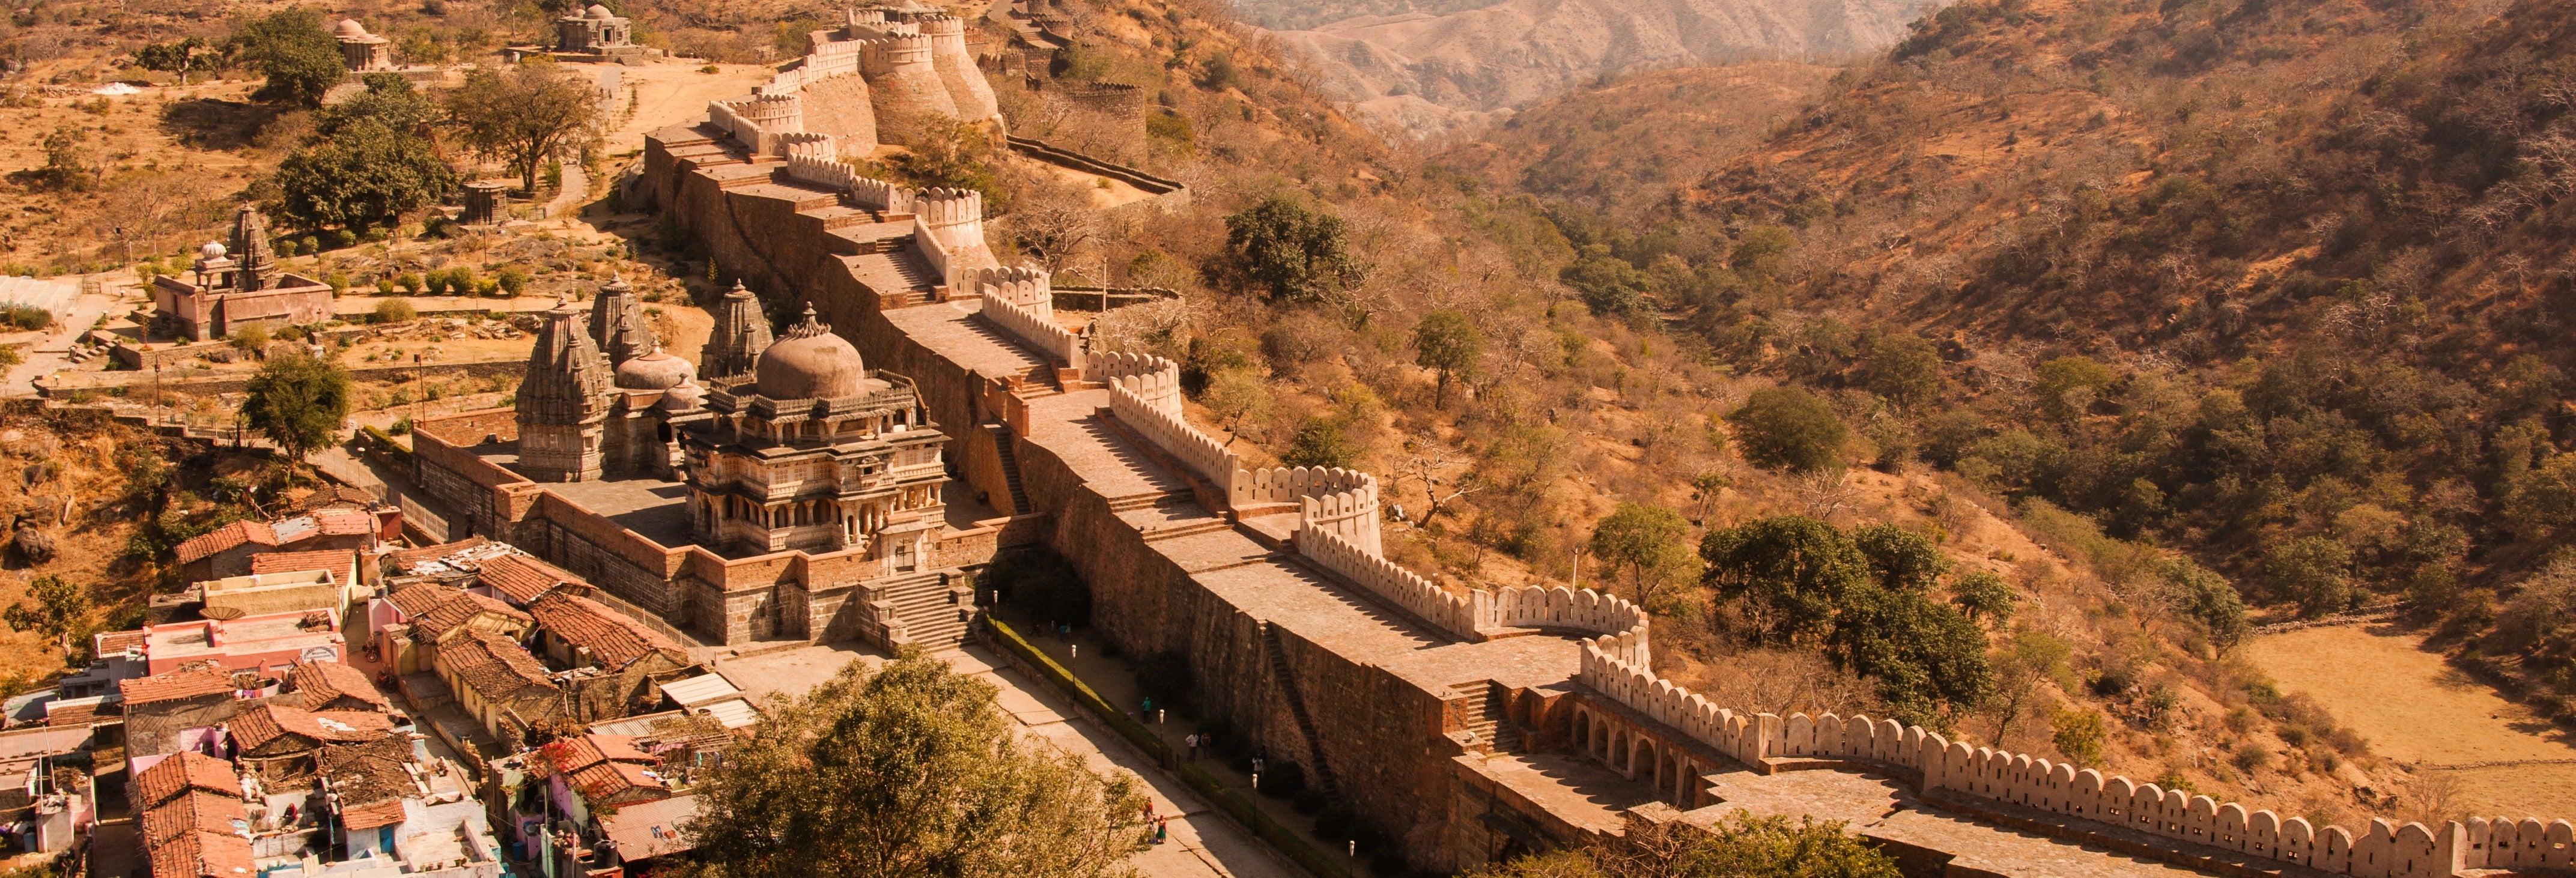 Excursão ao Forte Kumbhalgarh